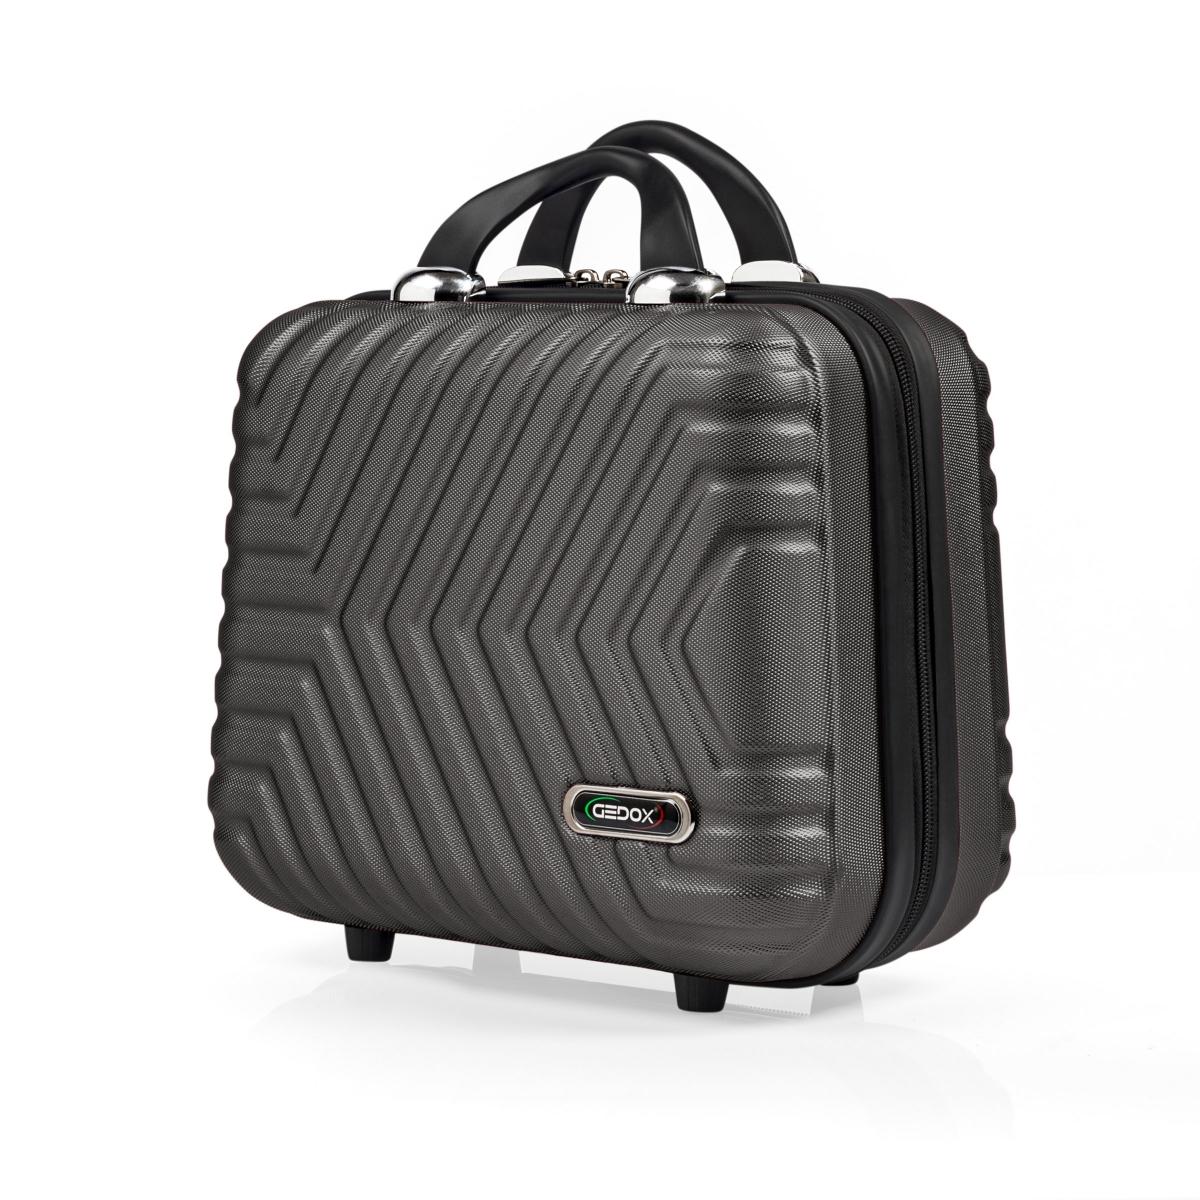 G&D Polo Suitcase Abs Makyaj&Hostes El Çantası Model:615.02 Koyu Gri